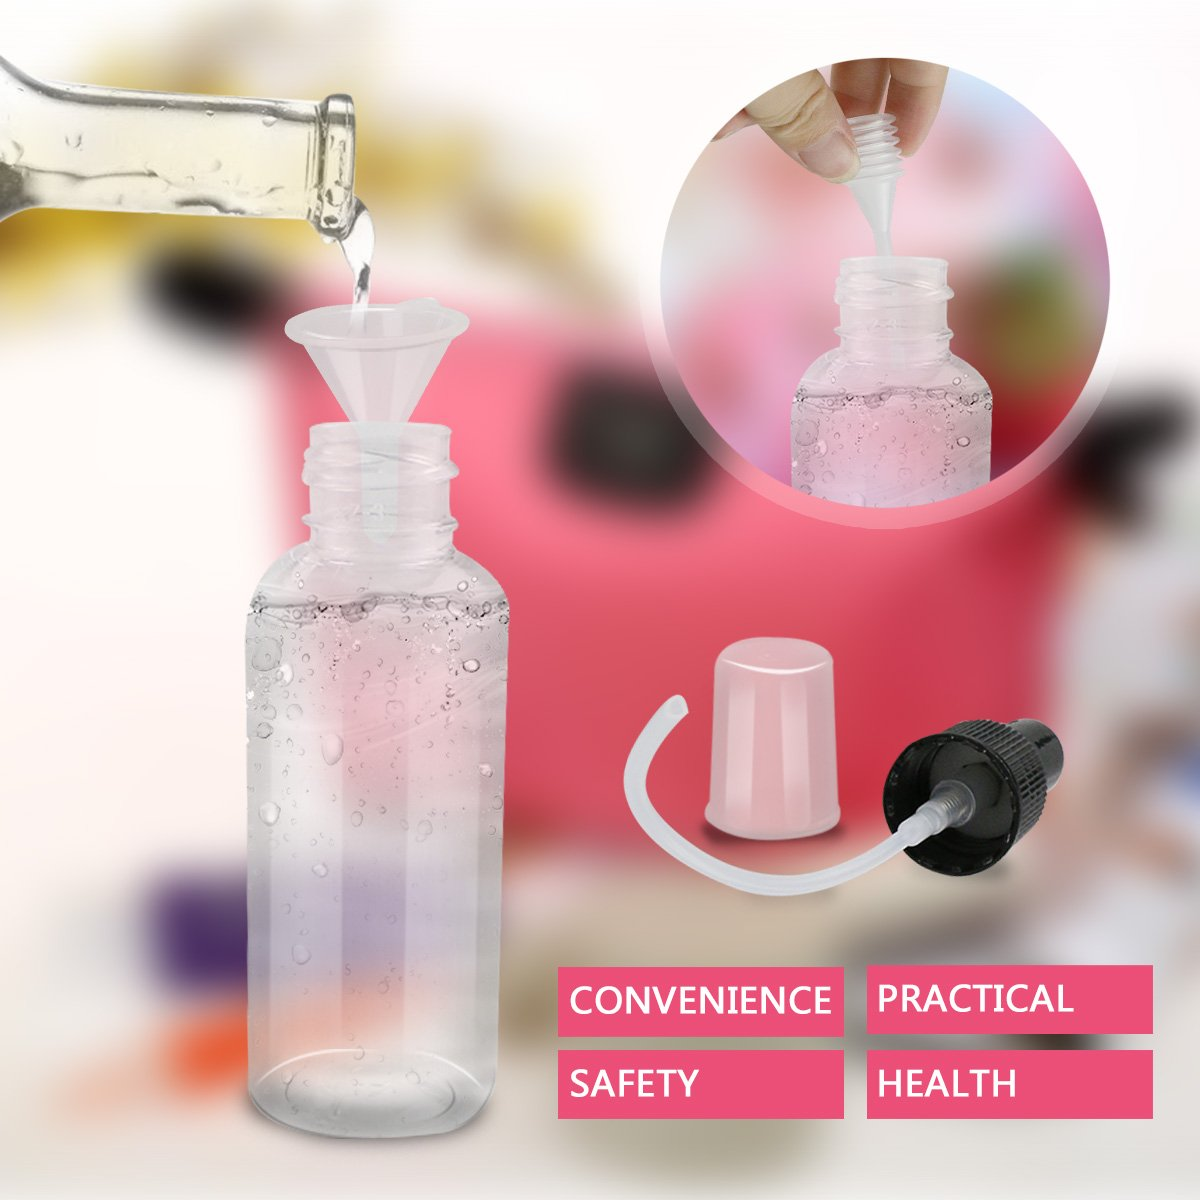 Botella de Pulverizacion Frascos de Spray Botes Transparentes con Pulverizador 6 * 50ml Plástico, Vacíos, para Perfume Chanmpú Viaje: Amazon.es: Belleza